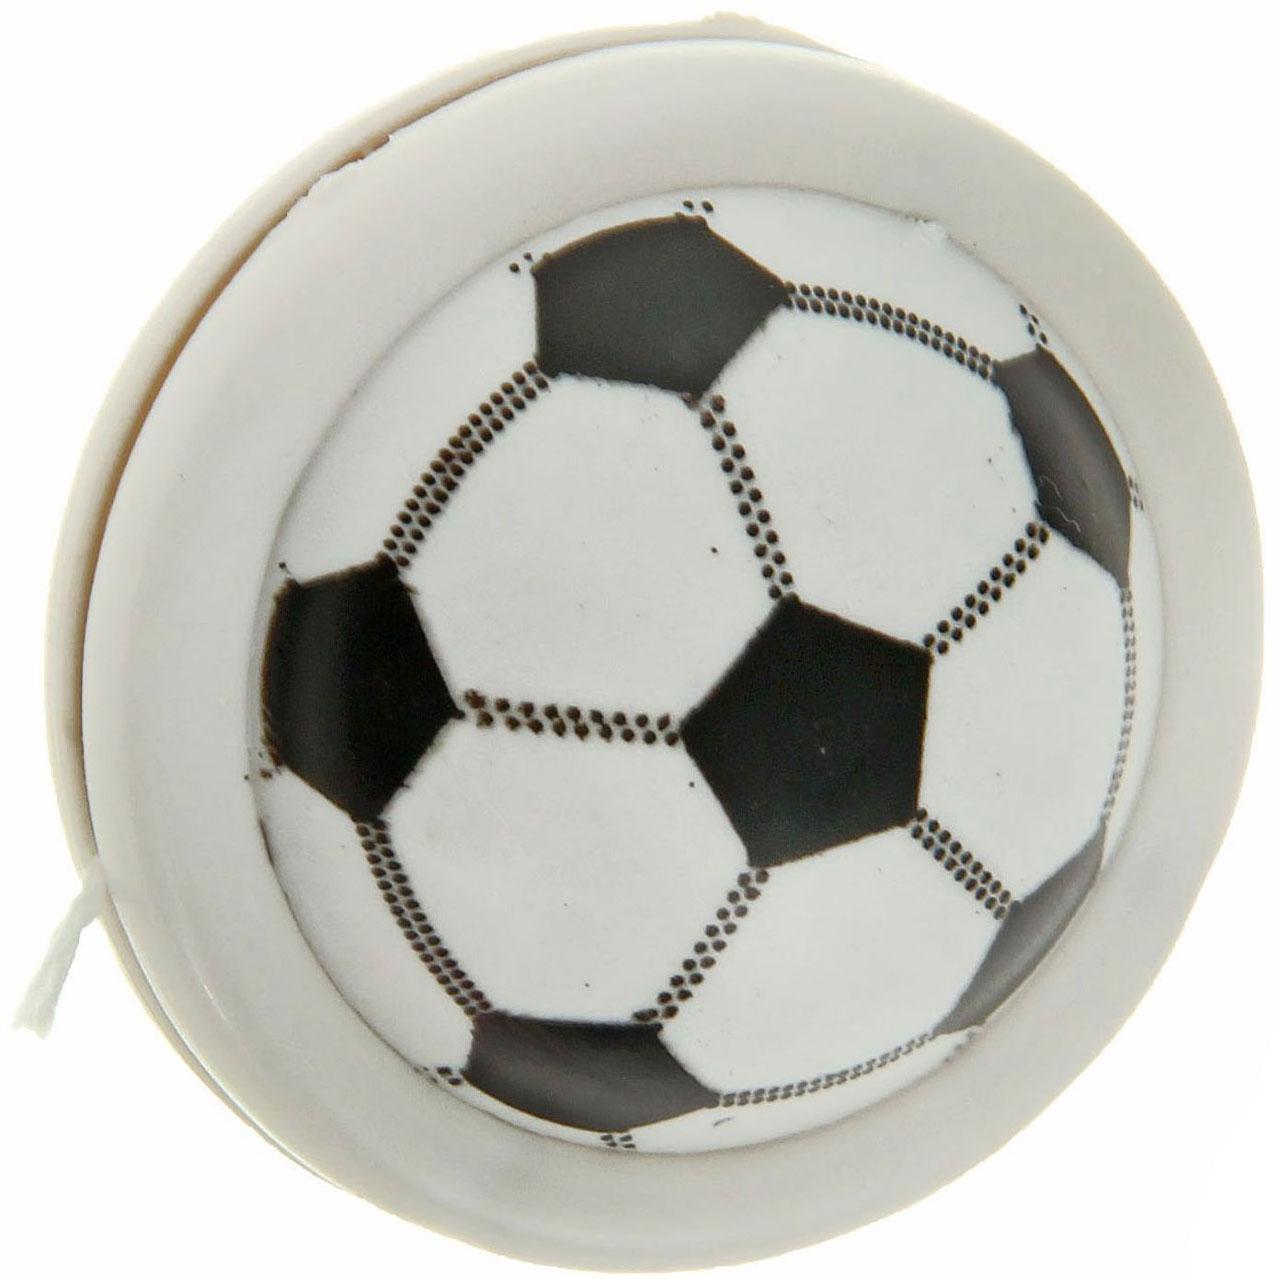 Sima-land Йо-йо Футбол цвет белый черный sima land йо йо футбол 1143950